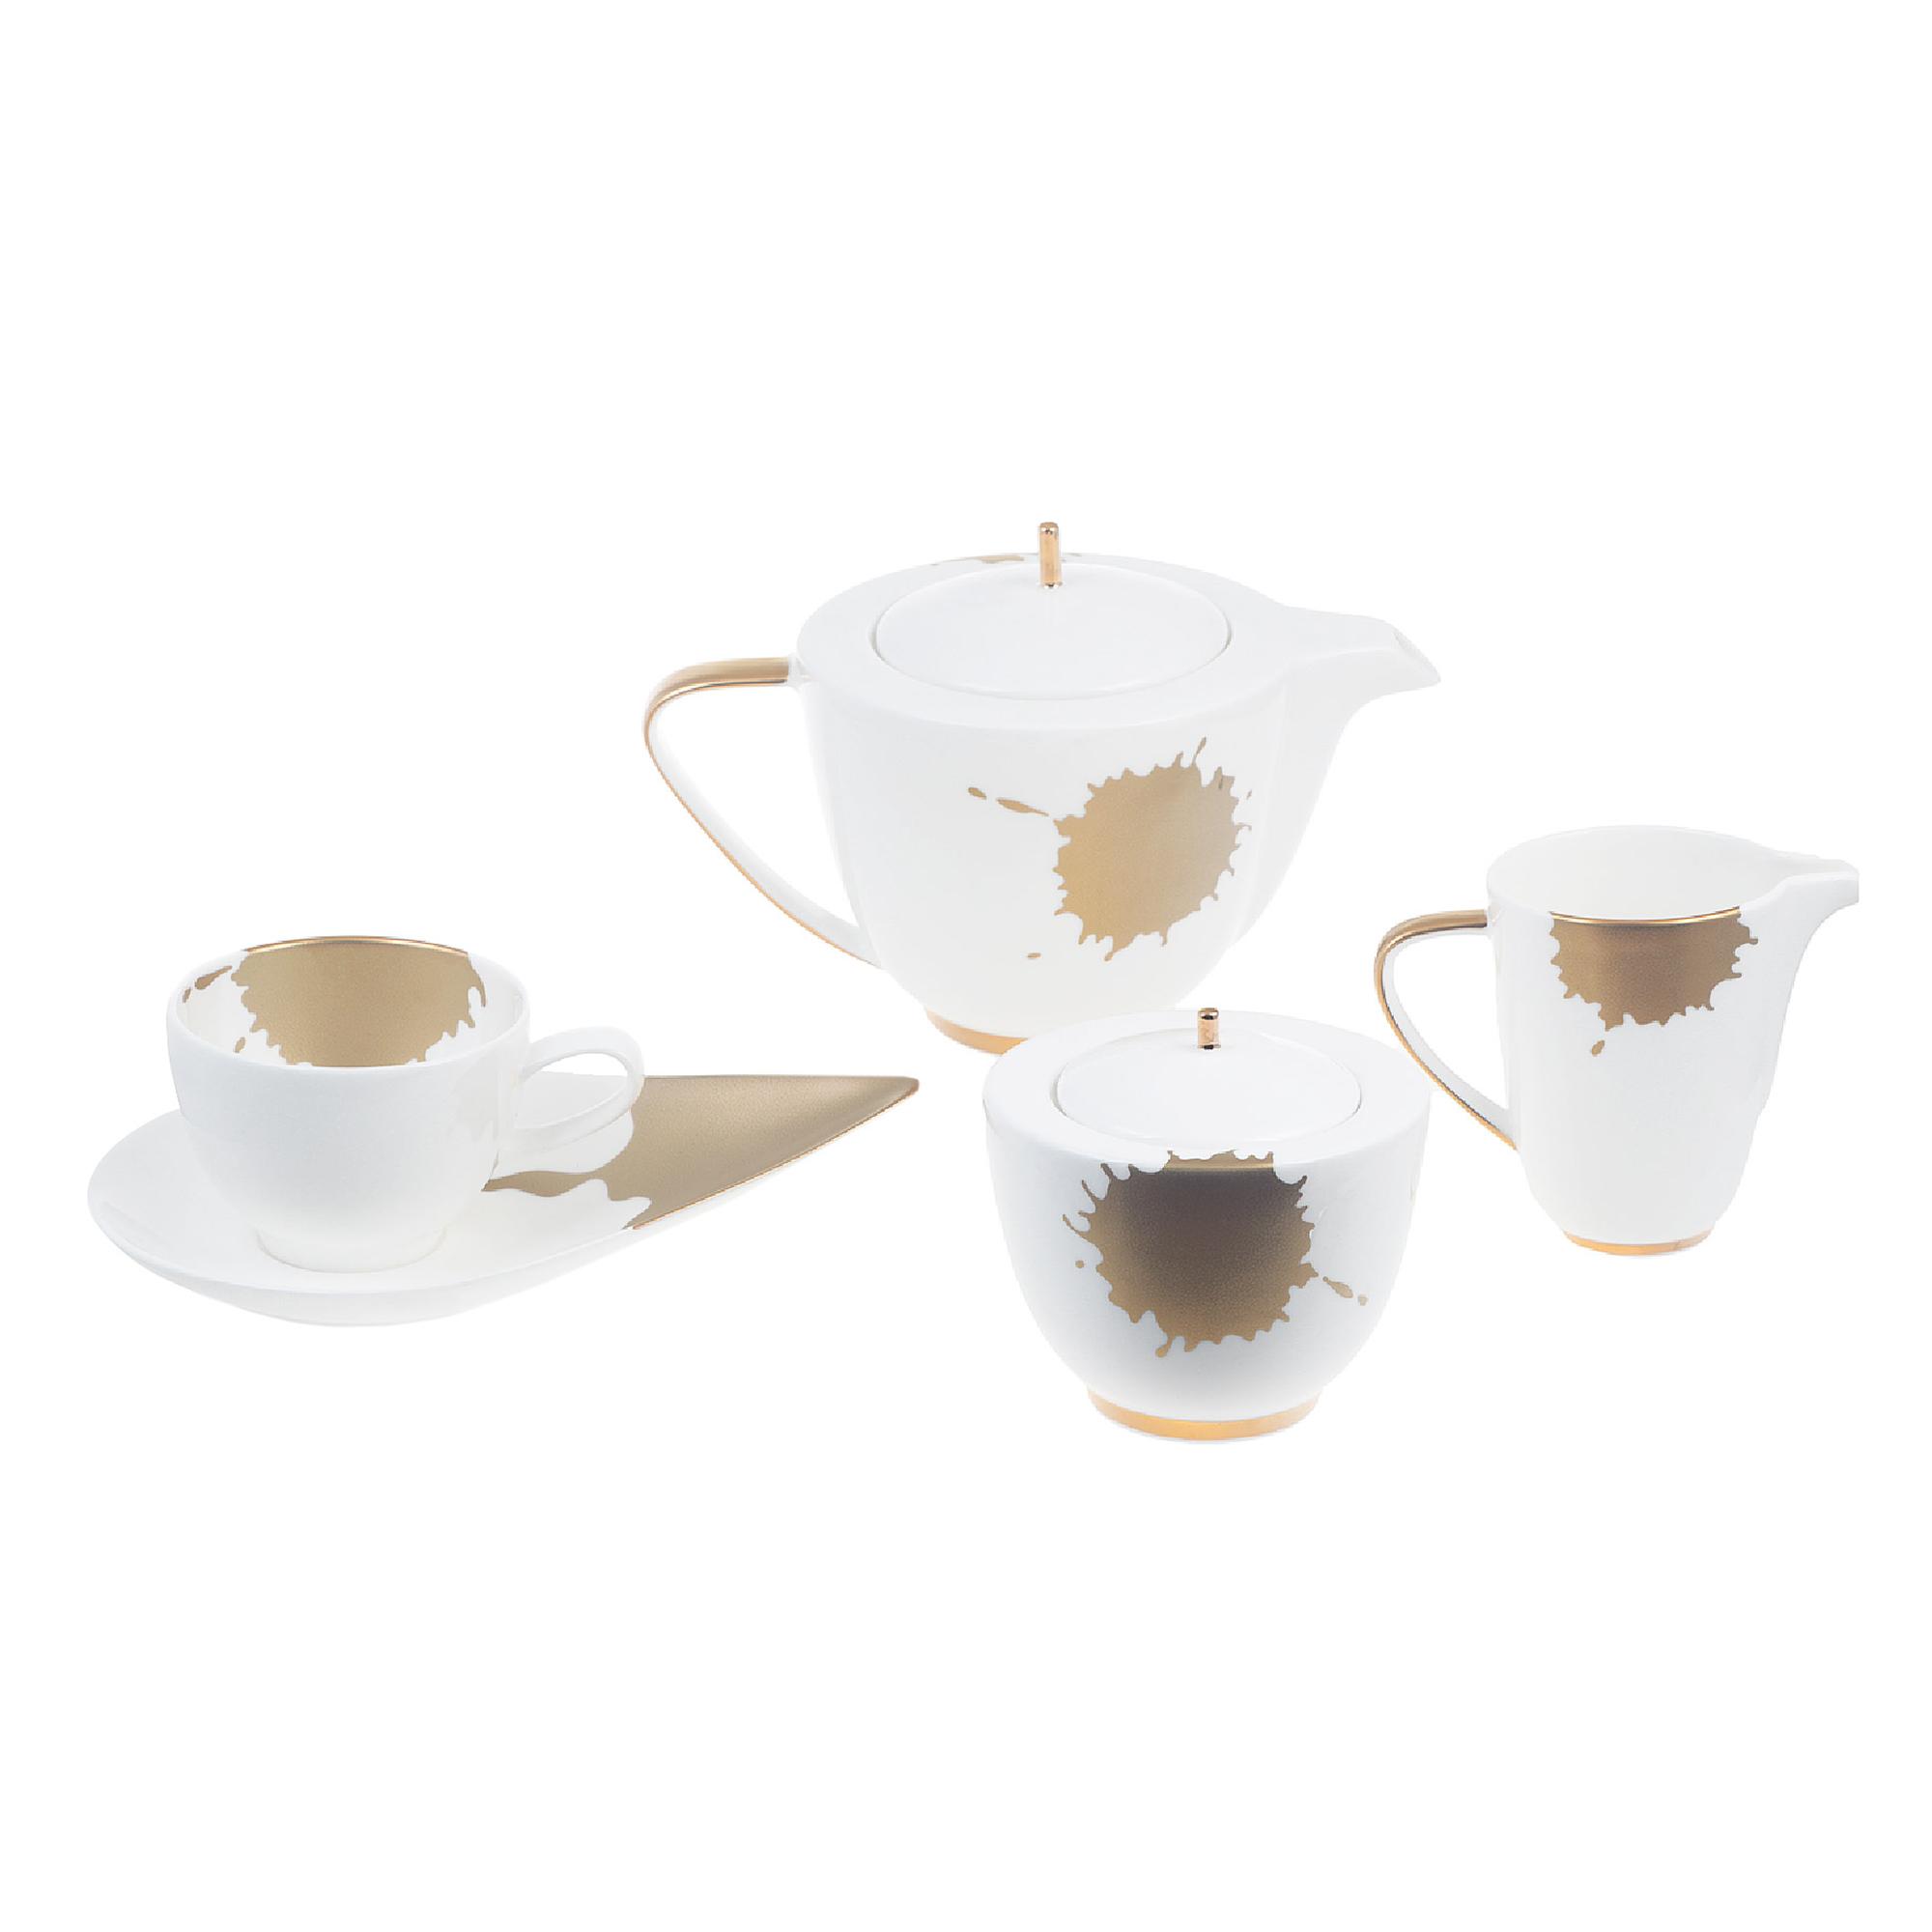 Сервиз чайный Hankook/Prouna Сплэш 9 предметов фото